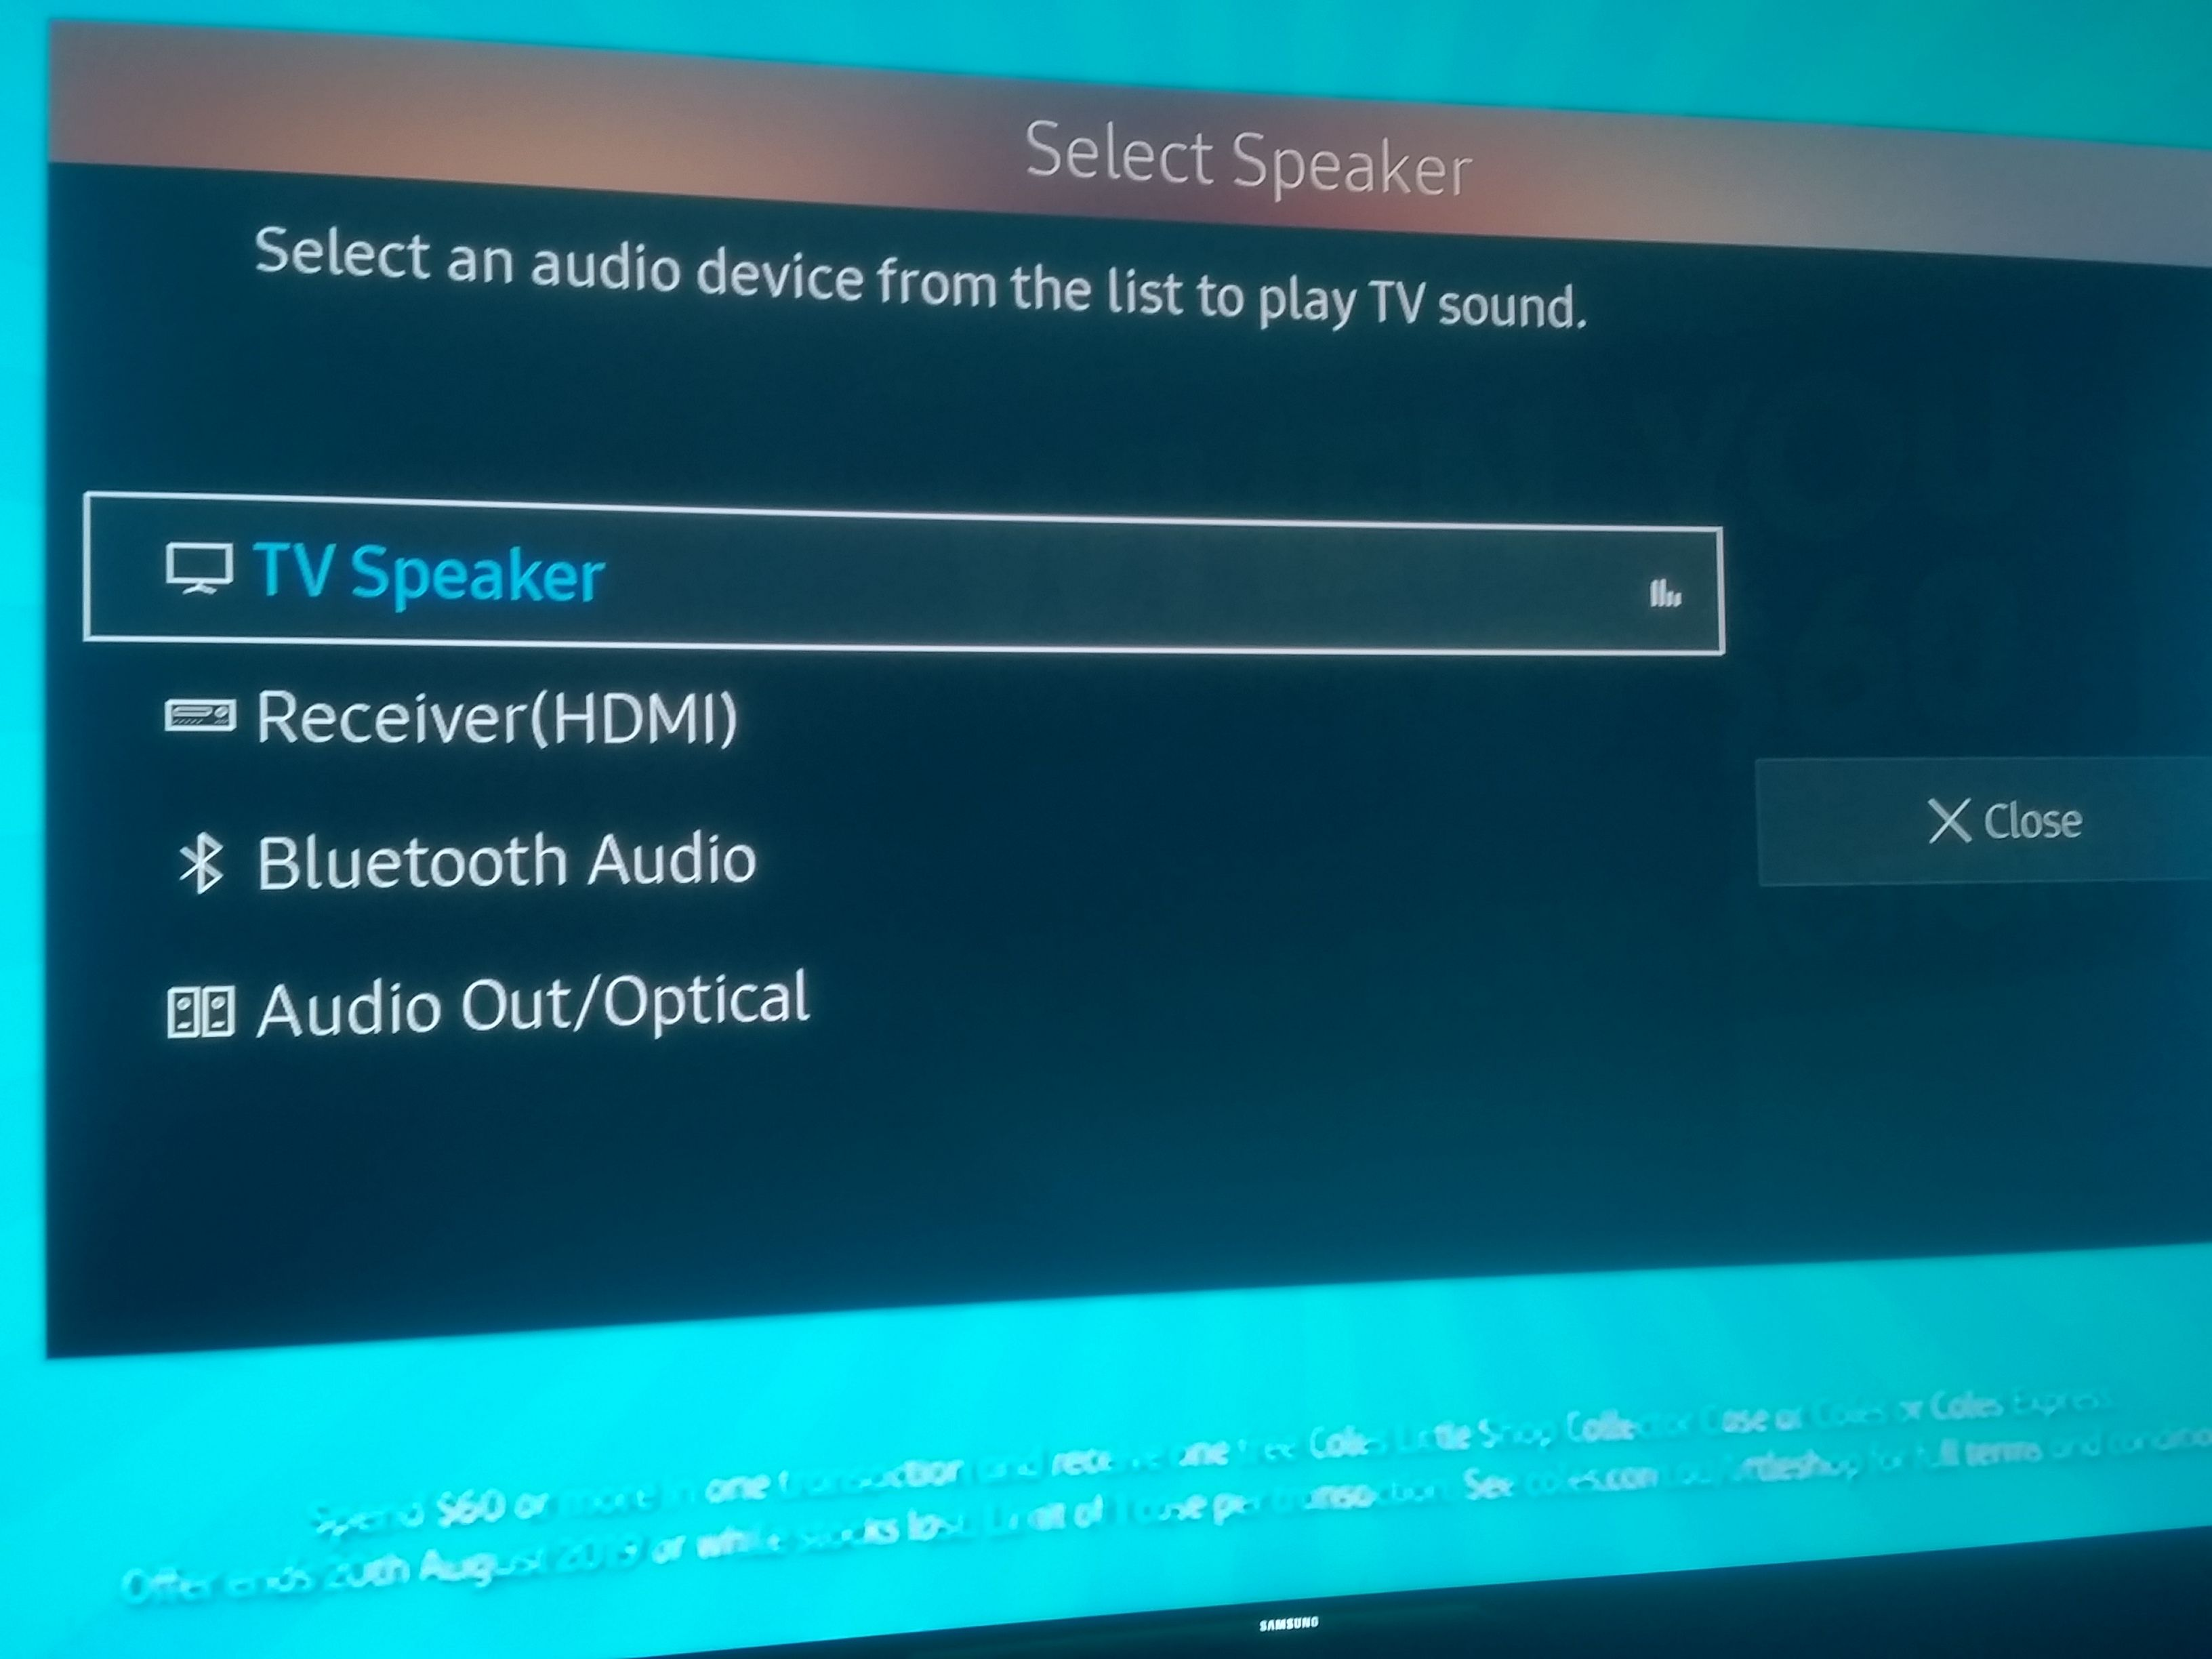 Digital TV sound through receiver speakers - Samsung Community